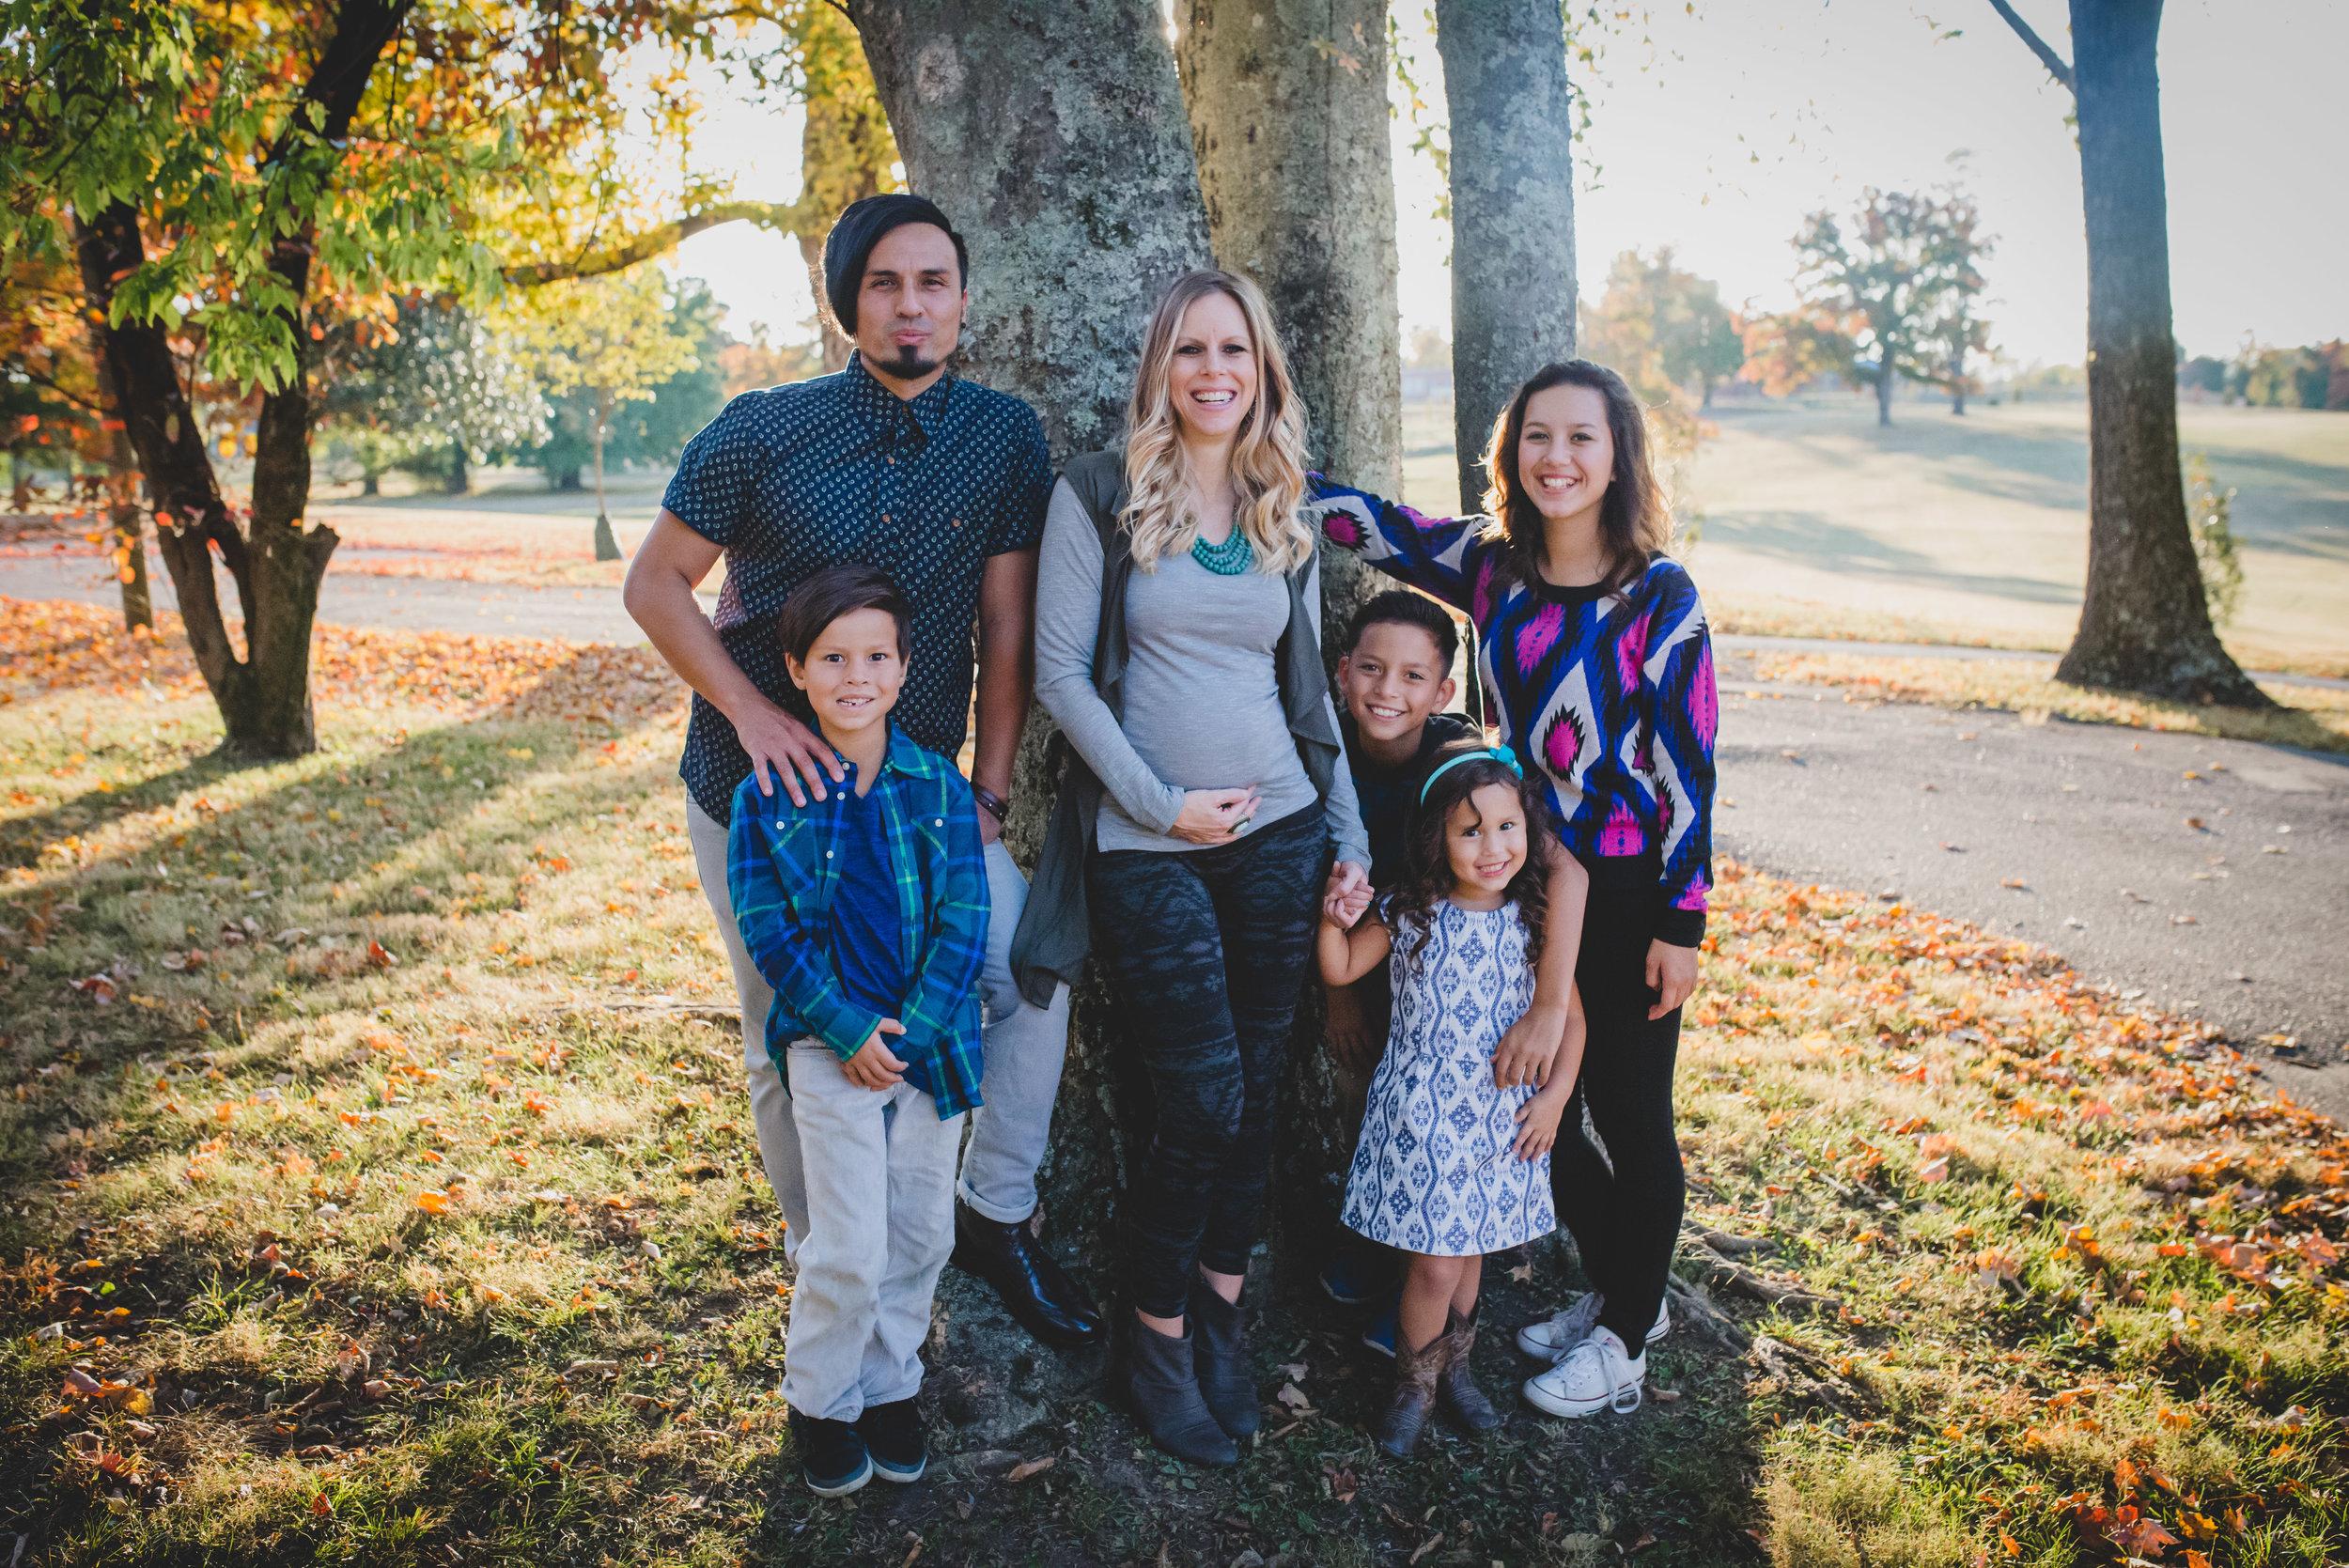 Gregg Garner with his wife, Tara, his daughter Genesis (who just turned 14), Justice, Xavier, Malayah (Fall 2016).